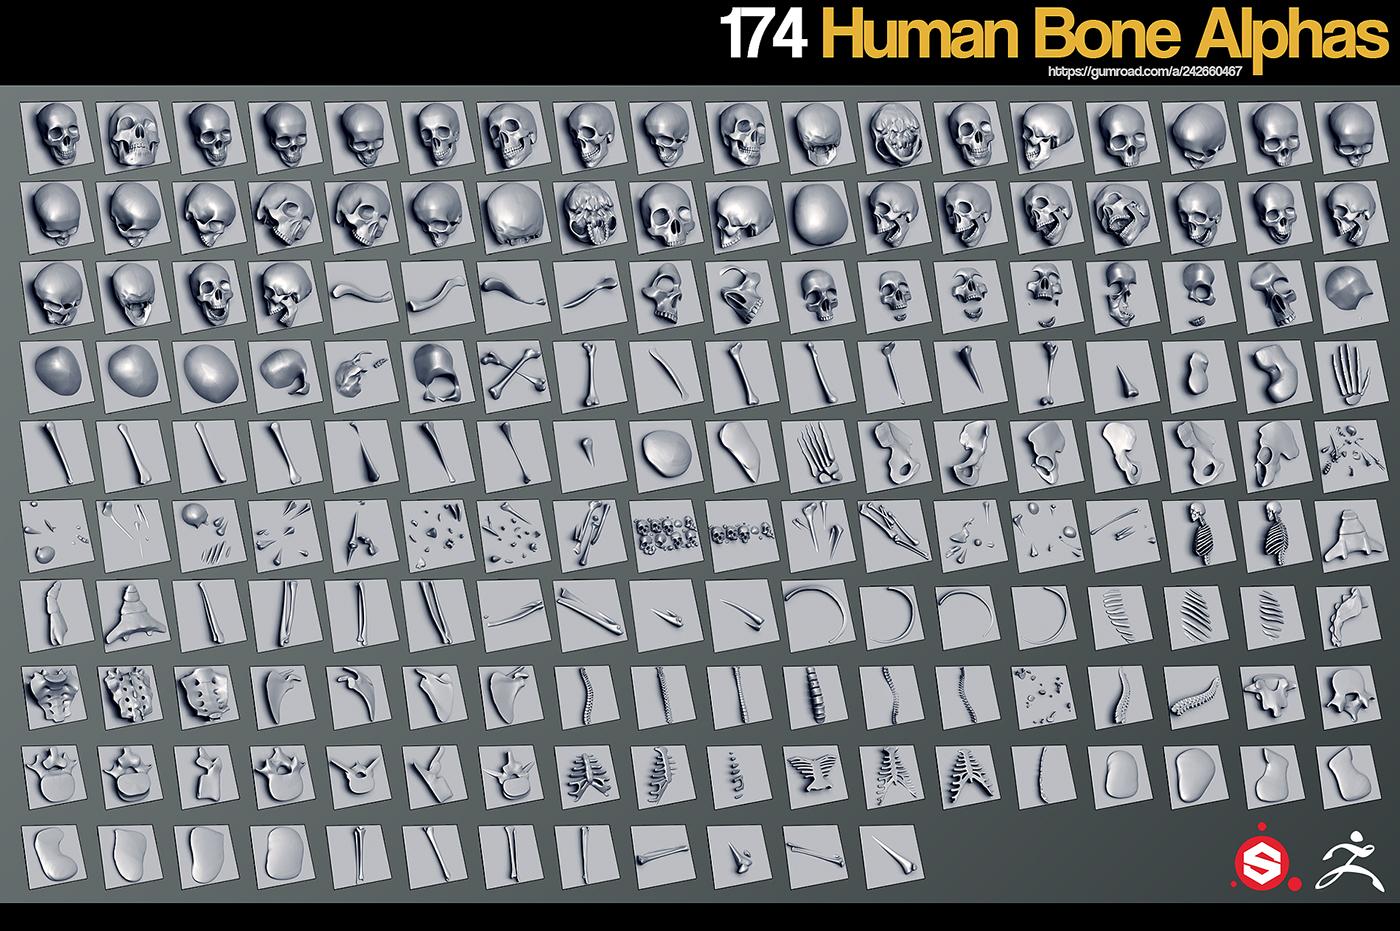 174 Human Bone Alphas on Behance